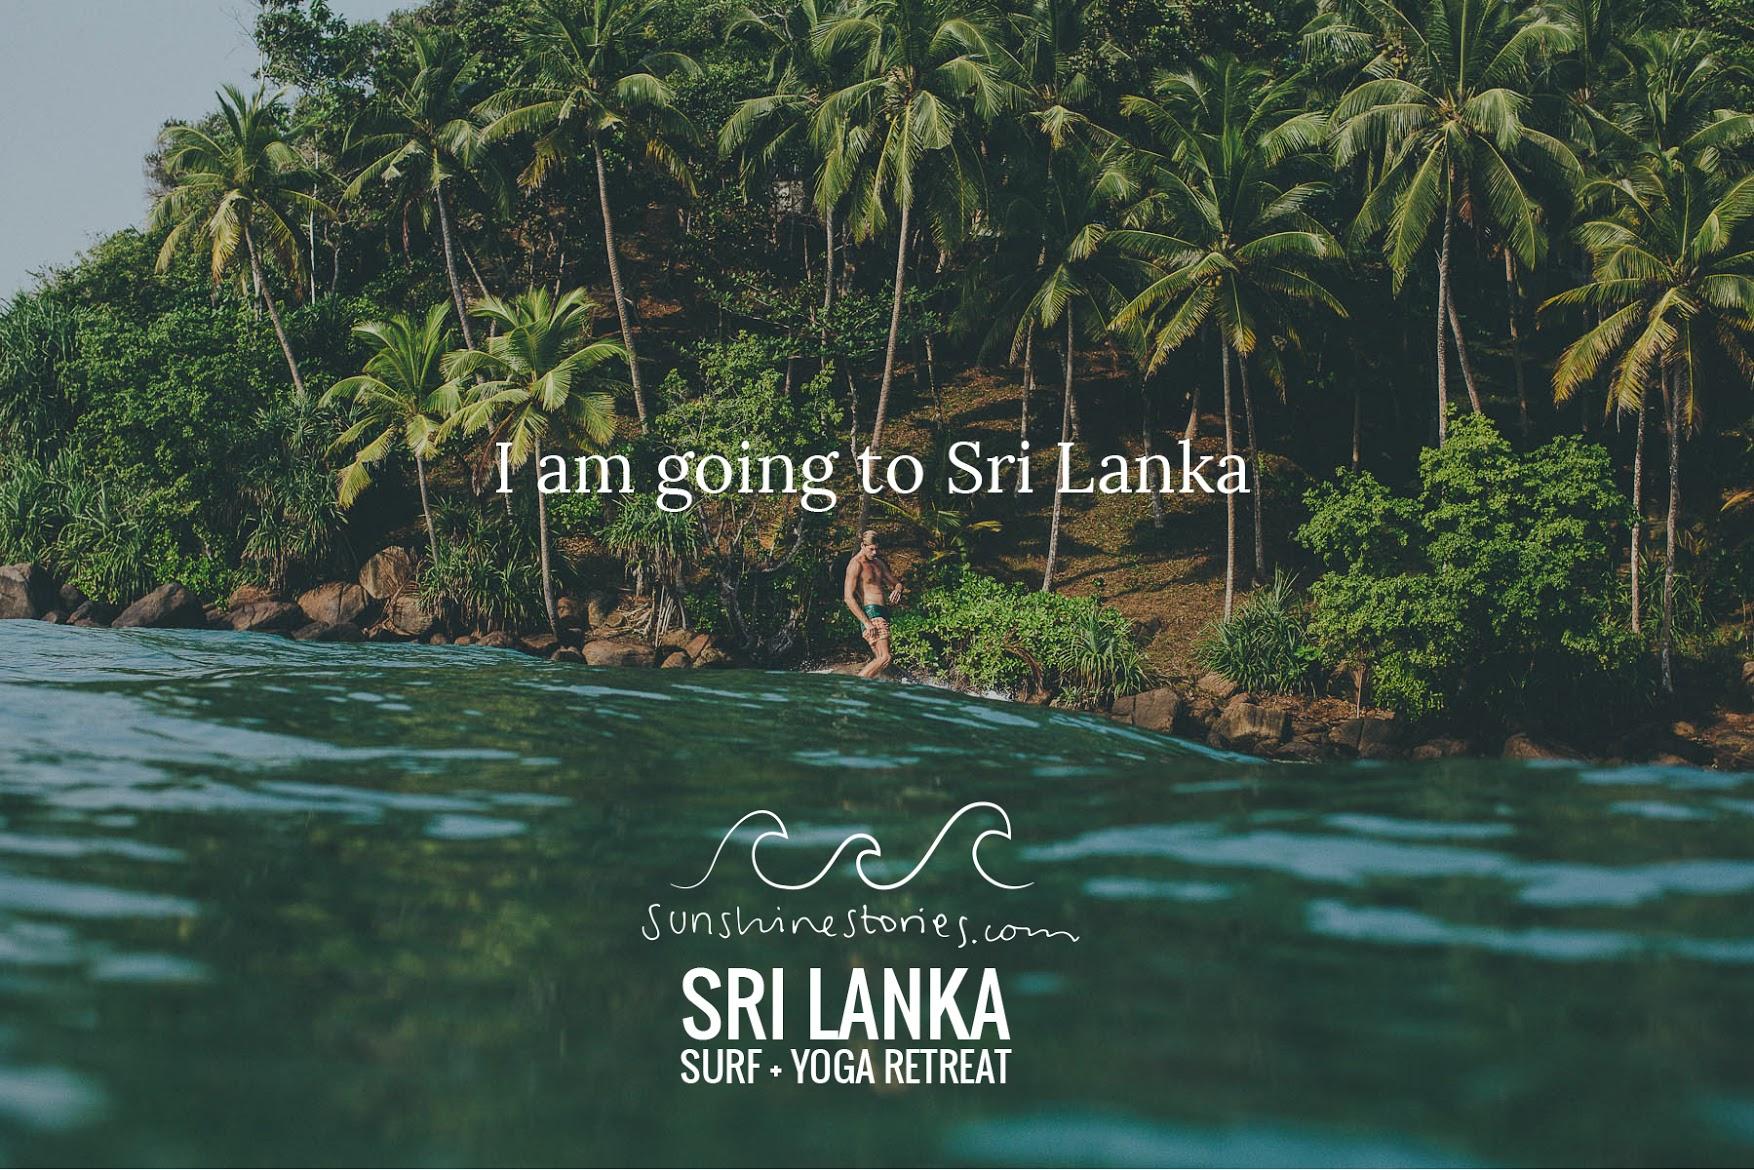 SUNSHINESTORIES SRI LANKA-10-2-05